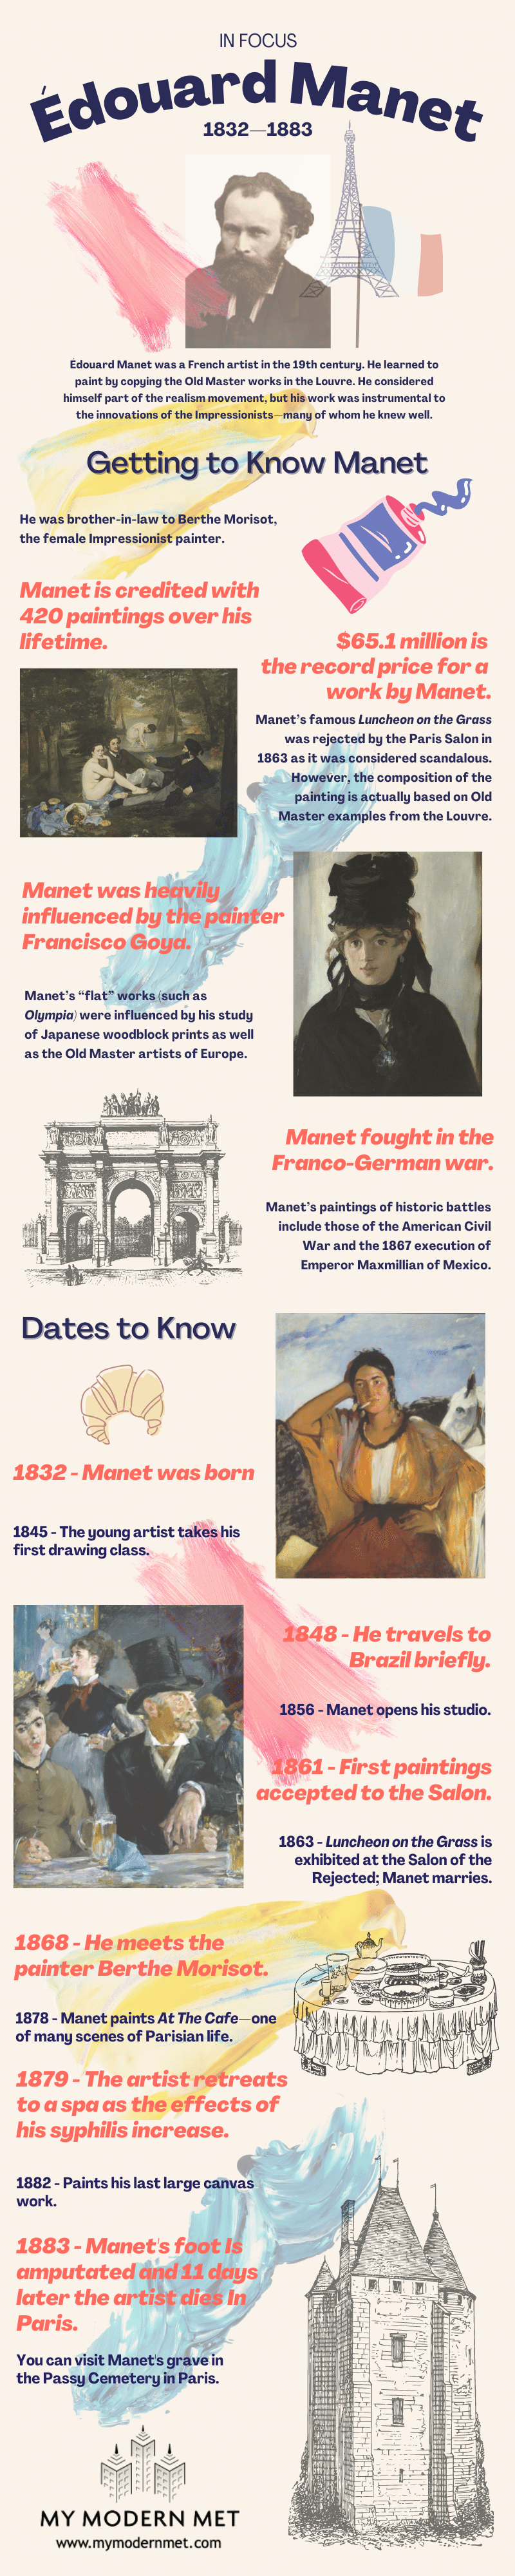 Edouard Manet Infographic